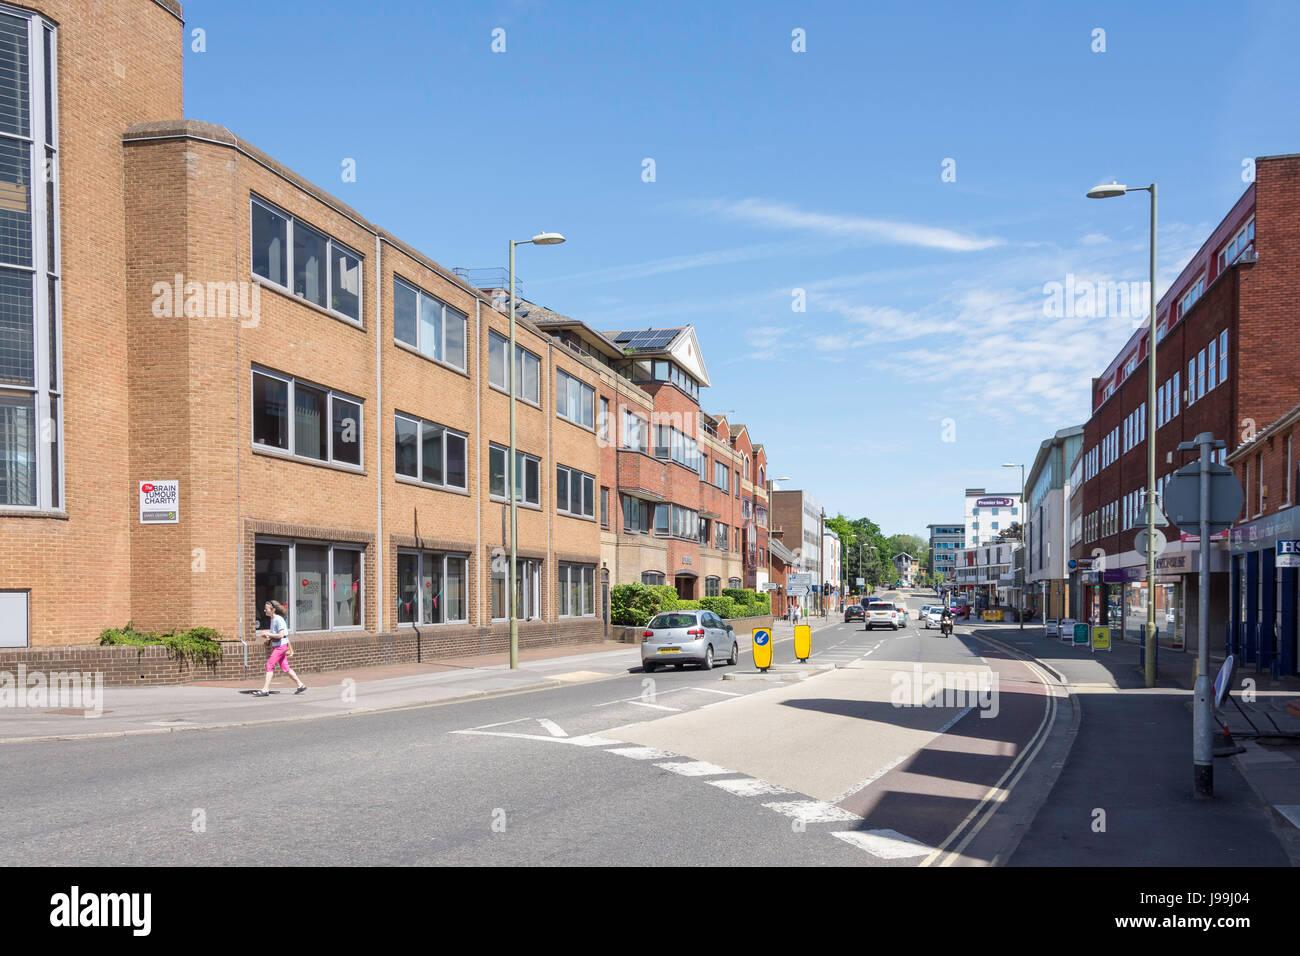 Victoria Road, Farnborough, Hampshire, England, United Kingdom - Stock Image